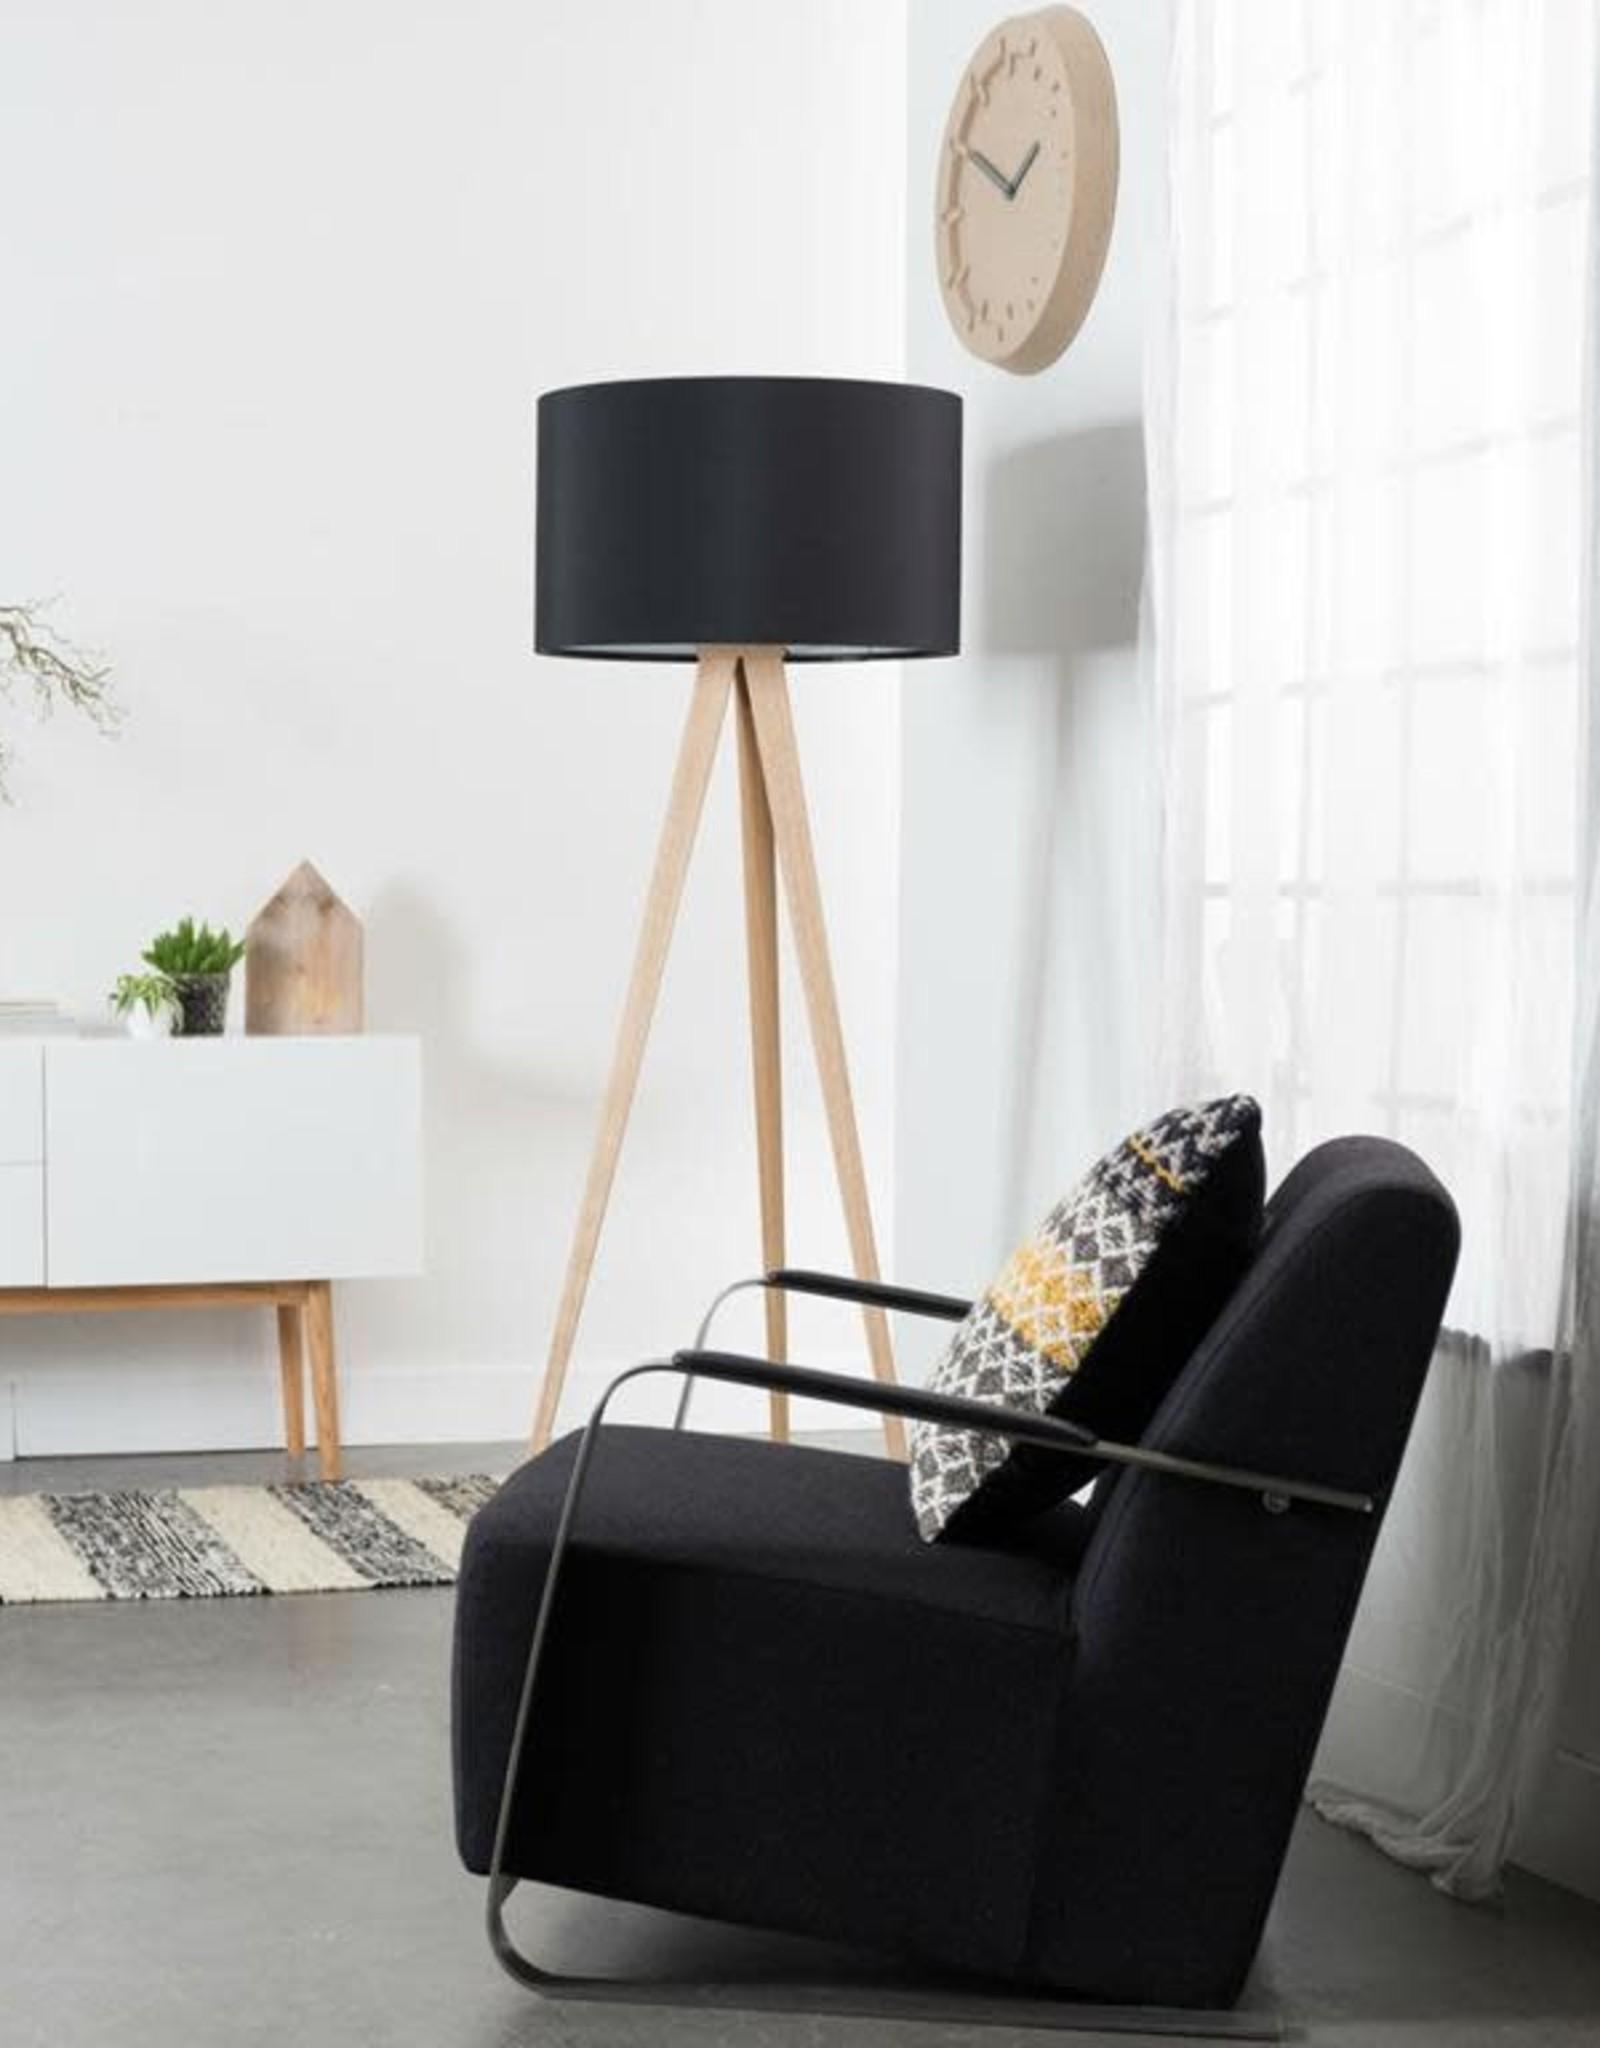 Zuiver Zuiver - Floor lamp tripod black - wood legs